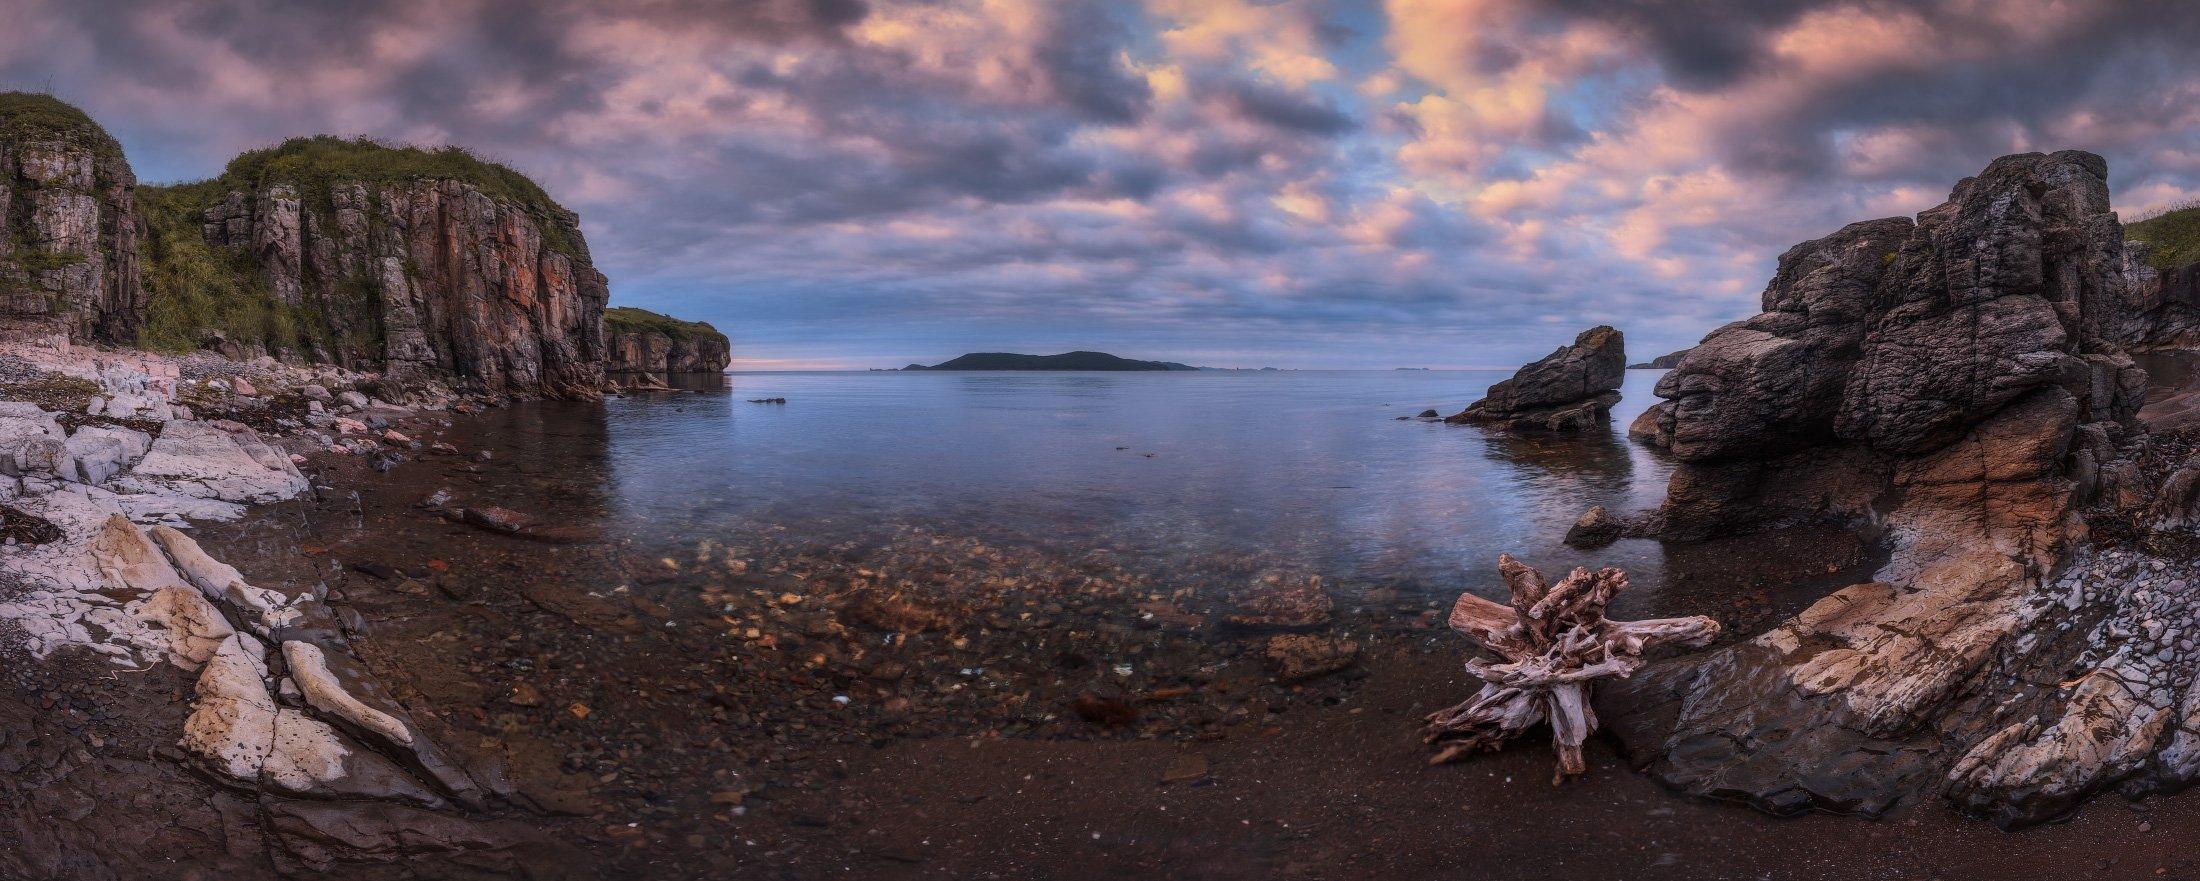 панорама, море, скалы, Андрей Кровлин